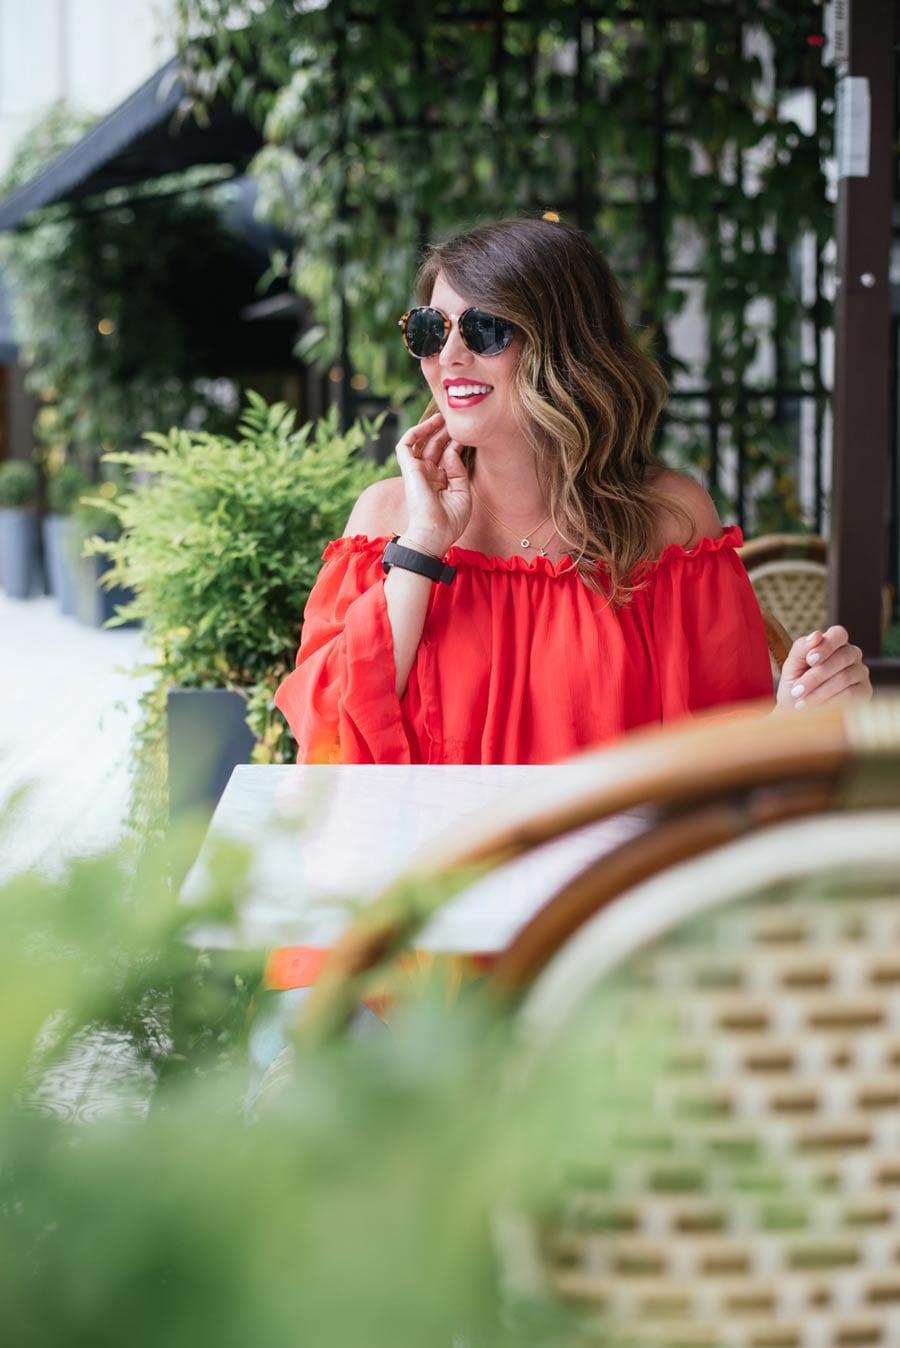 Jillian-Harris-Chic-Wish-Red-Dress-06